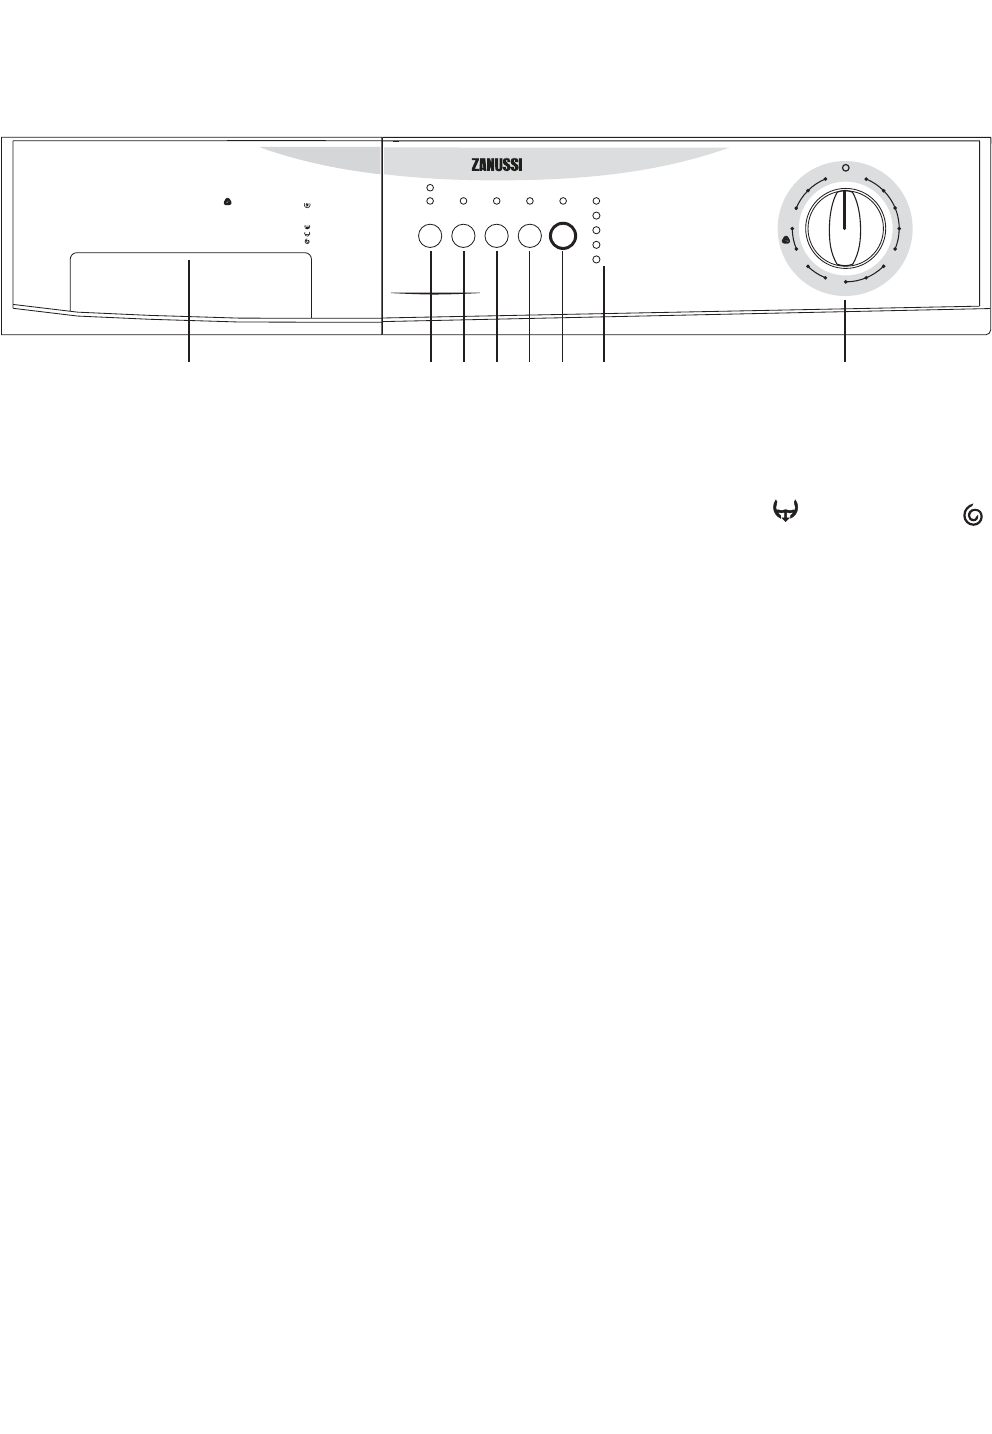 Zanussi zwf 1410 resetten